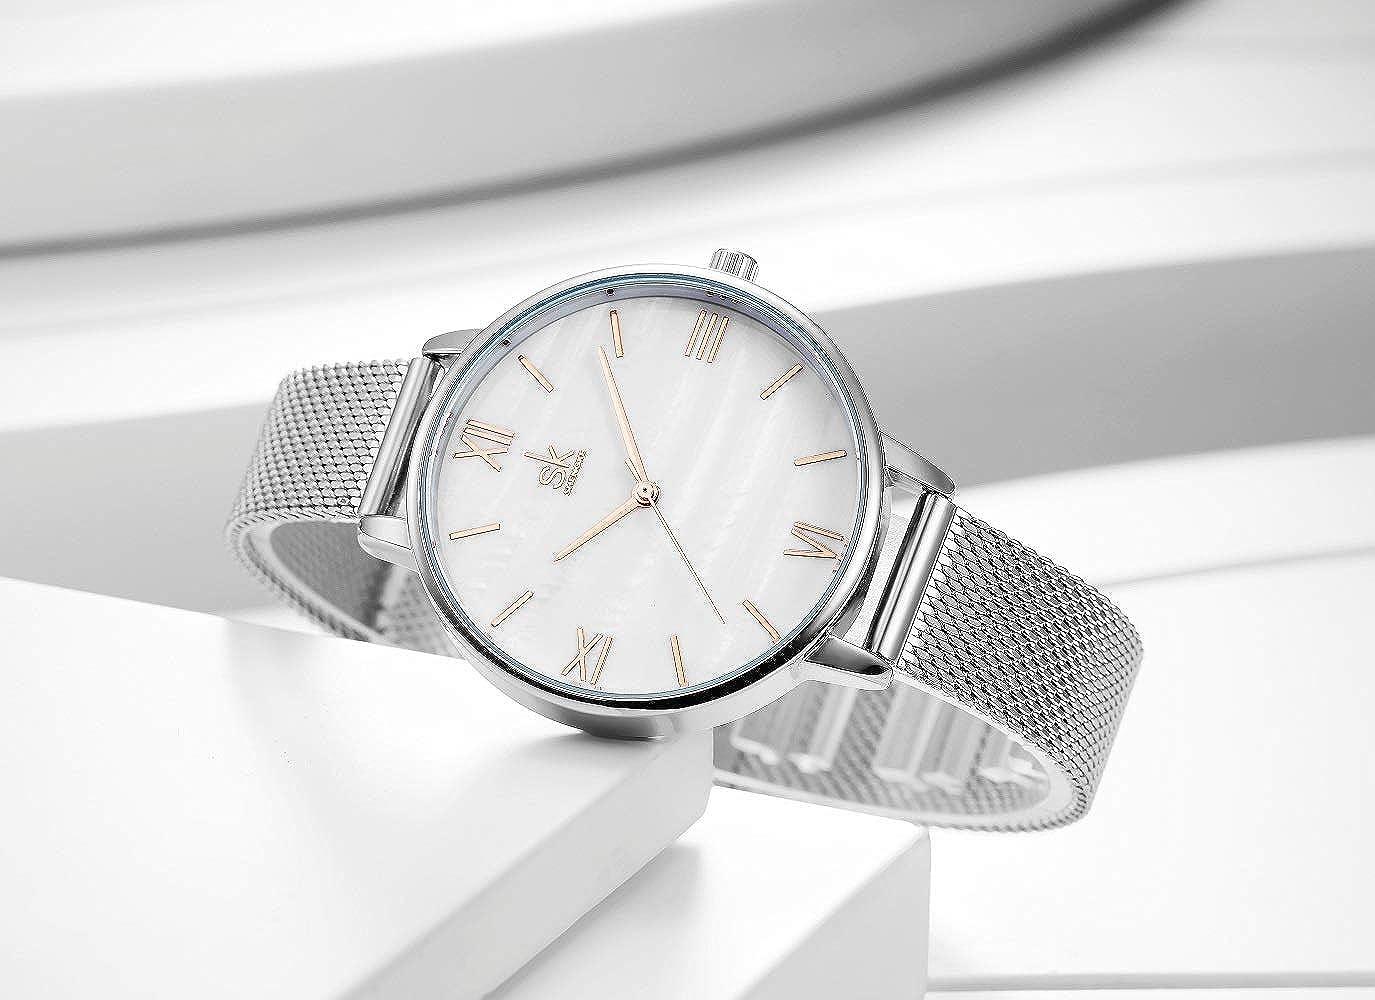 Amazon.com: SHENGKE Creative Simplicity Women Watch Mesh Band Elegant Women Watches Ladies Business Wristwatch (K0039-silver-mesh Band): Watches